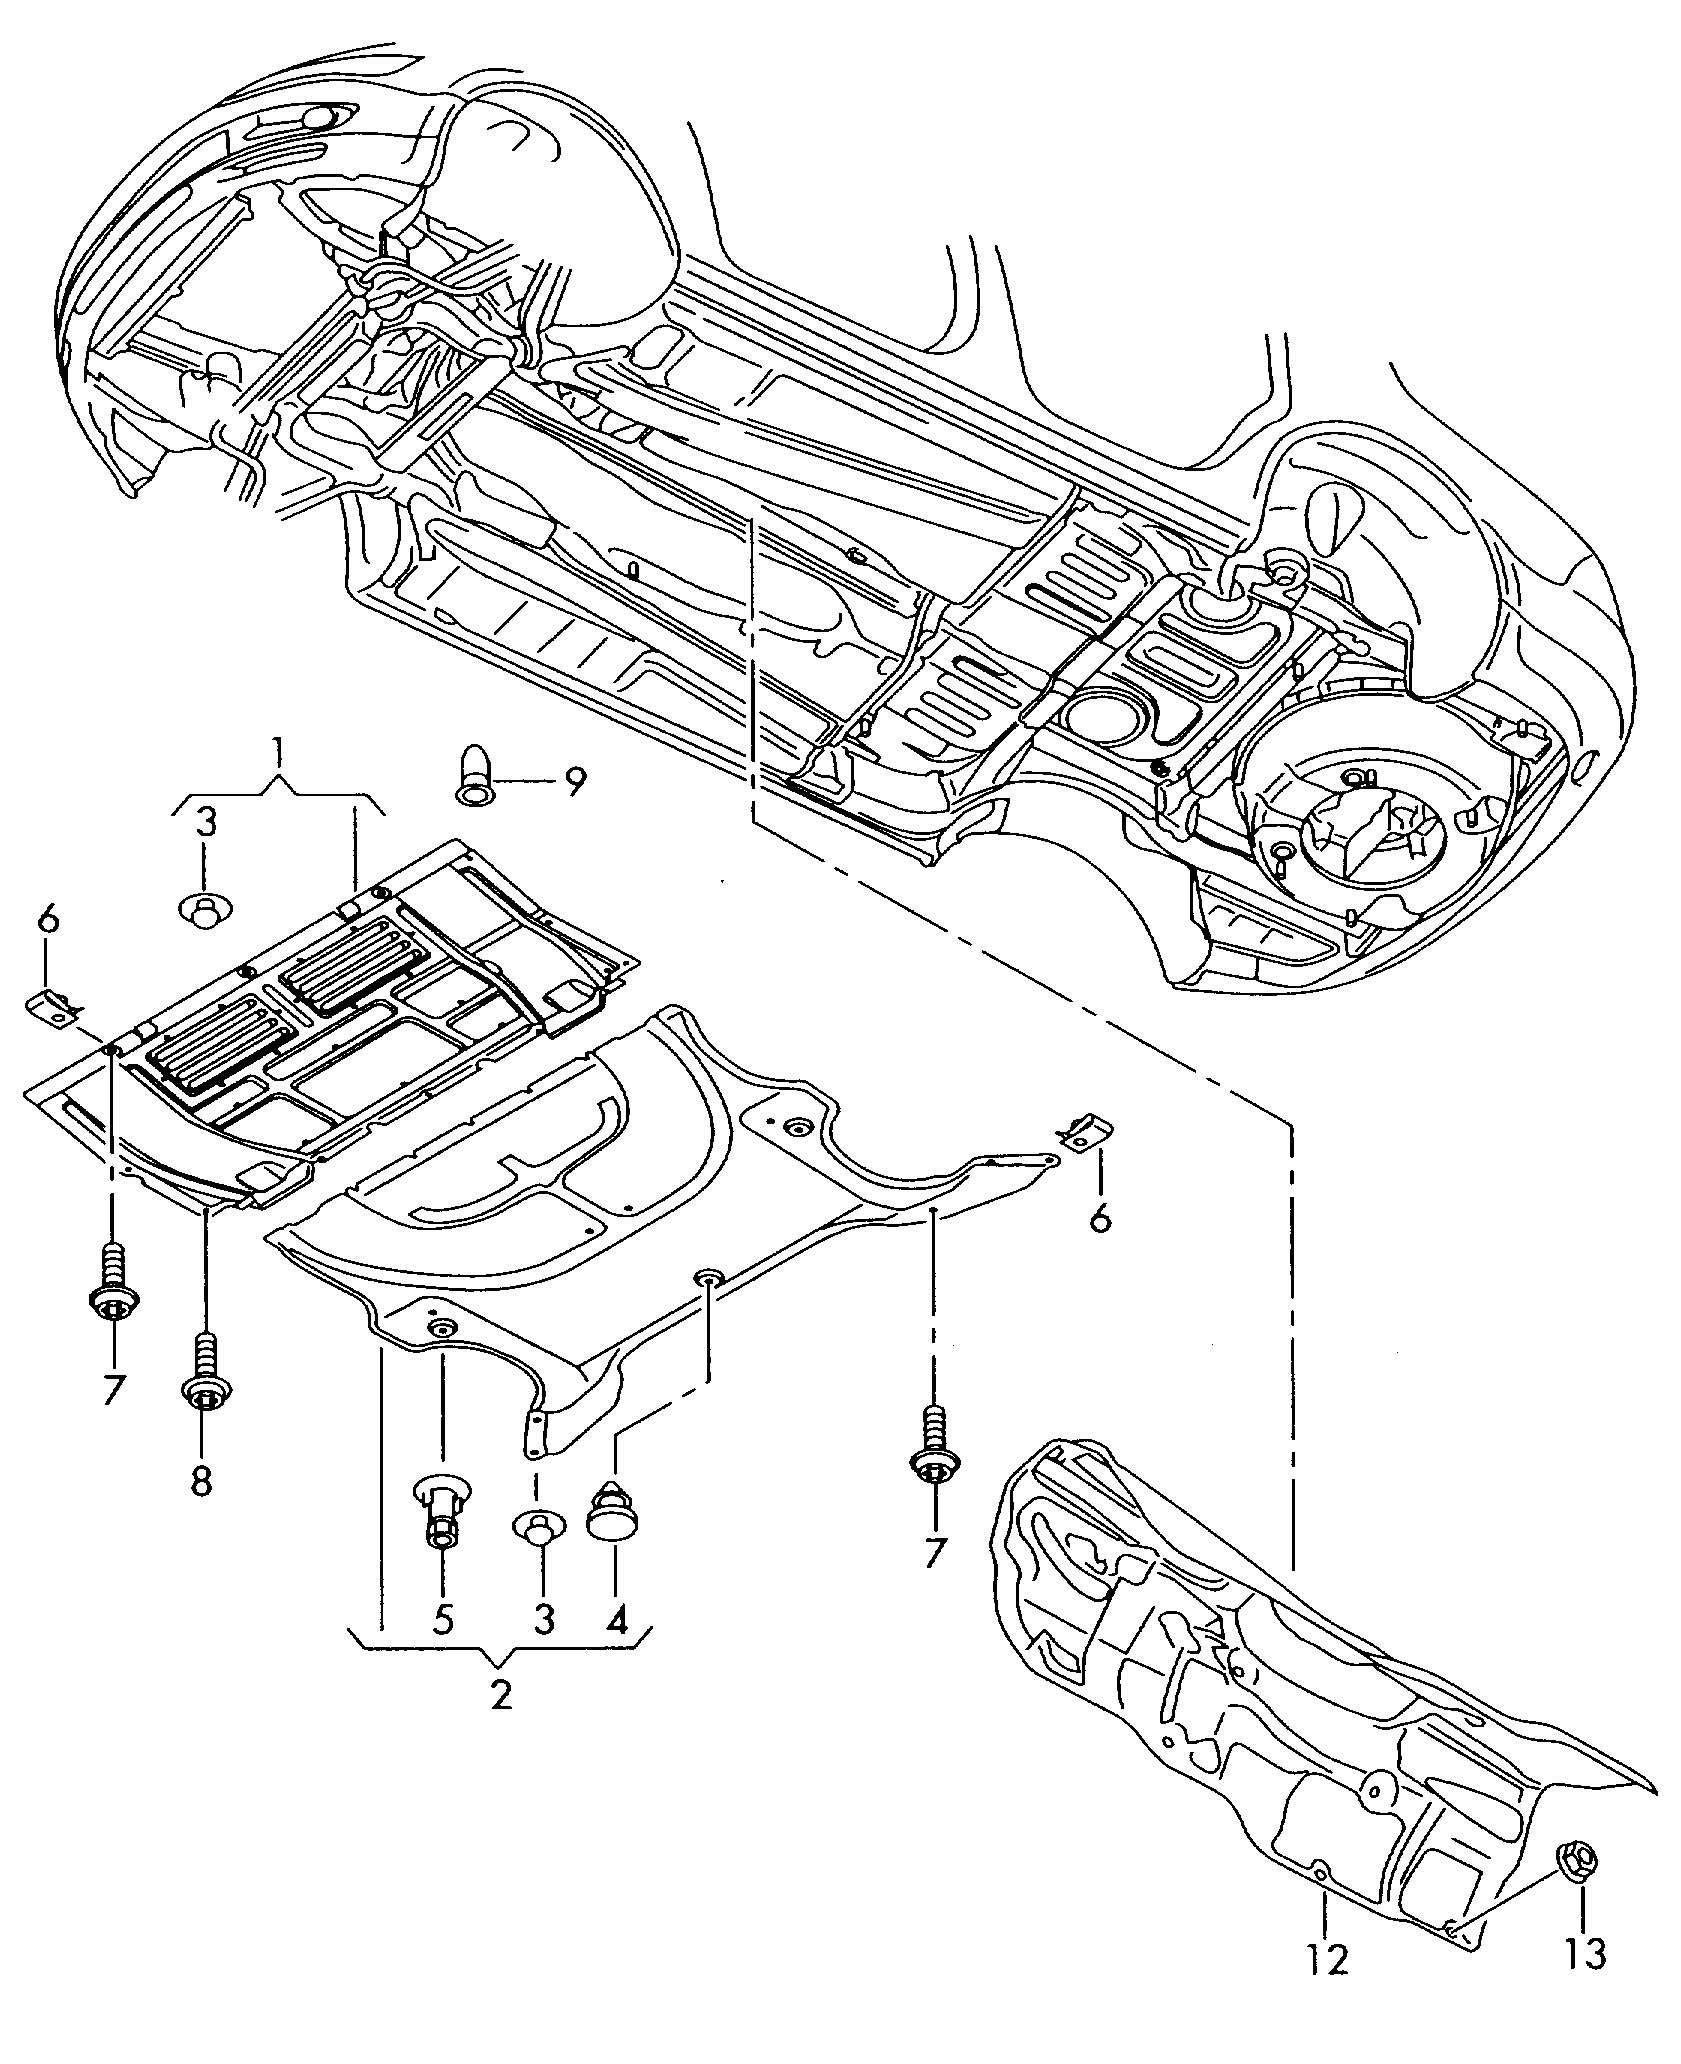 mk4 gti headlight wiring diagram kenwood stereo color code golf imageresizertool com